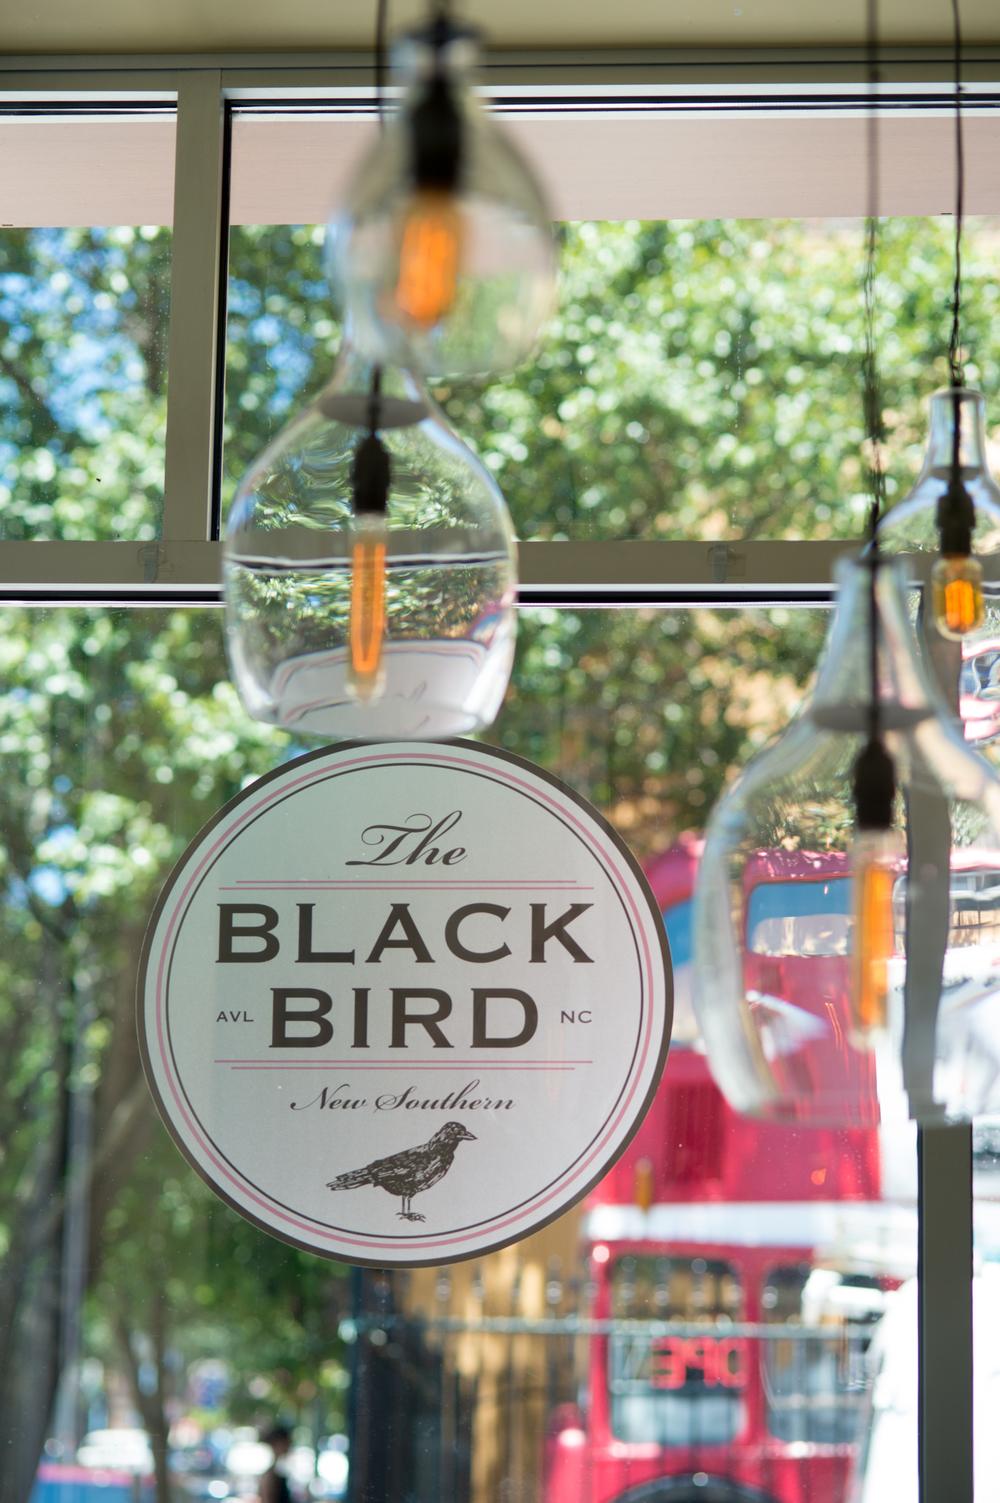 Blackbird012.jpg